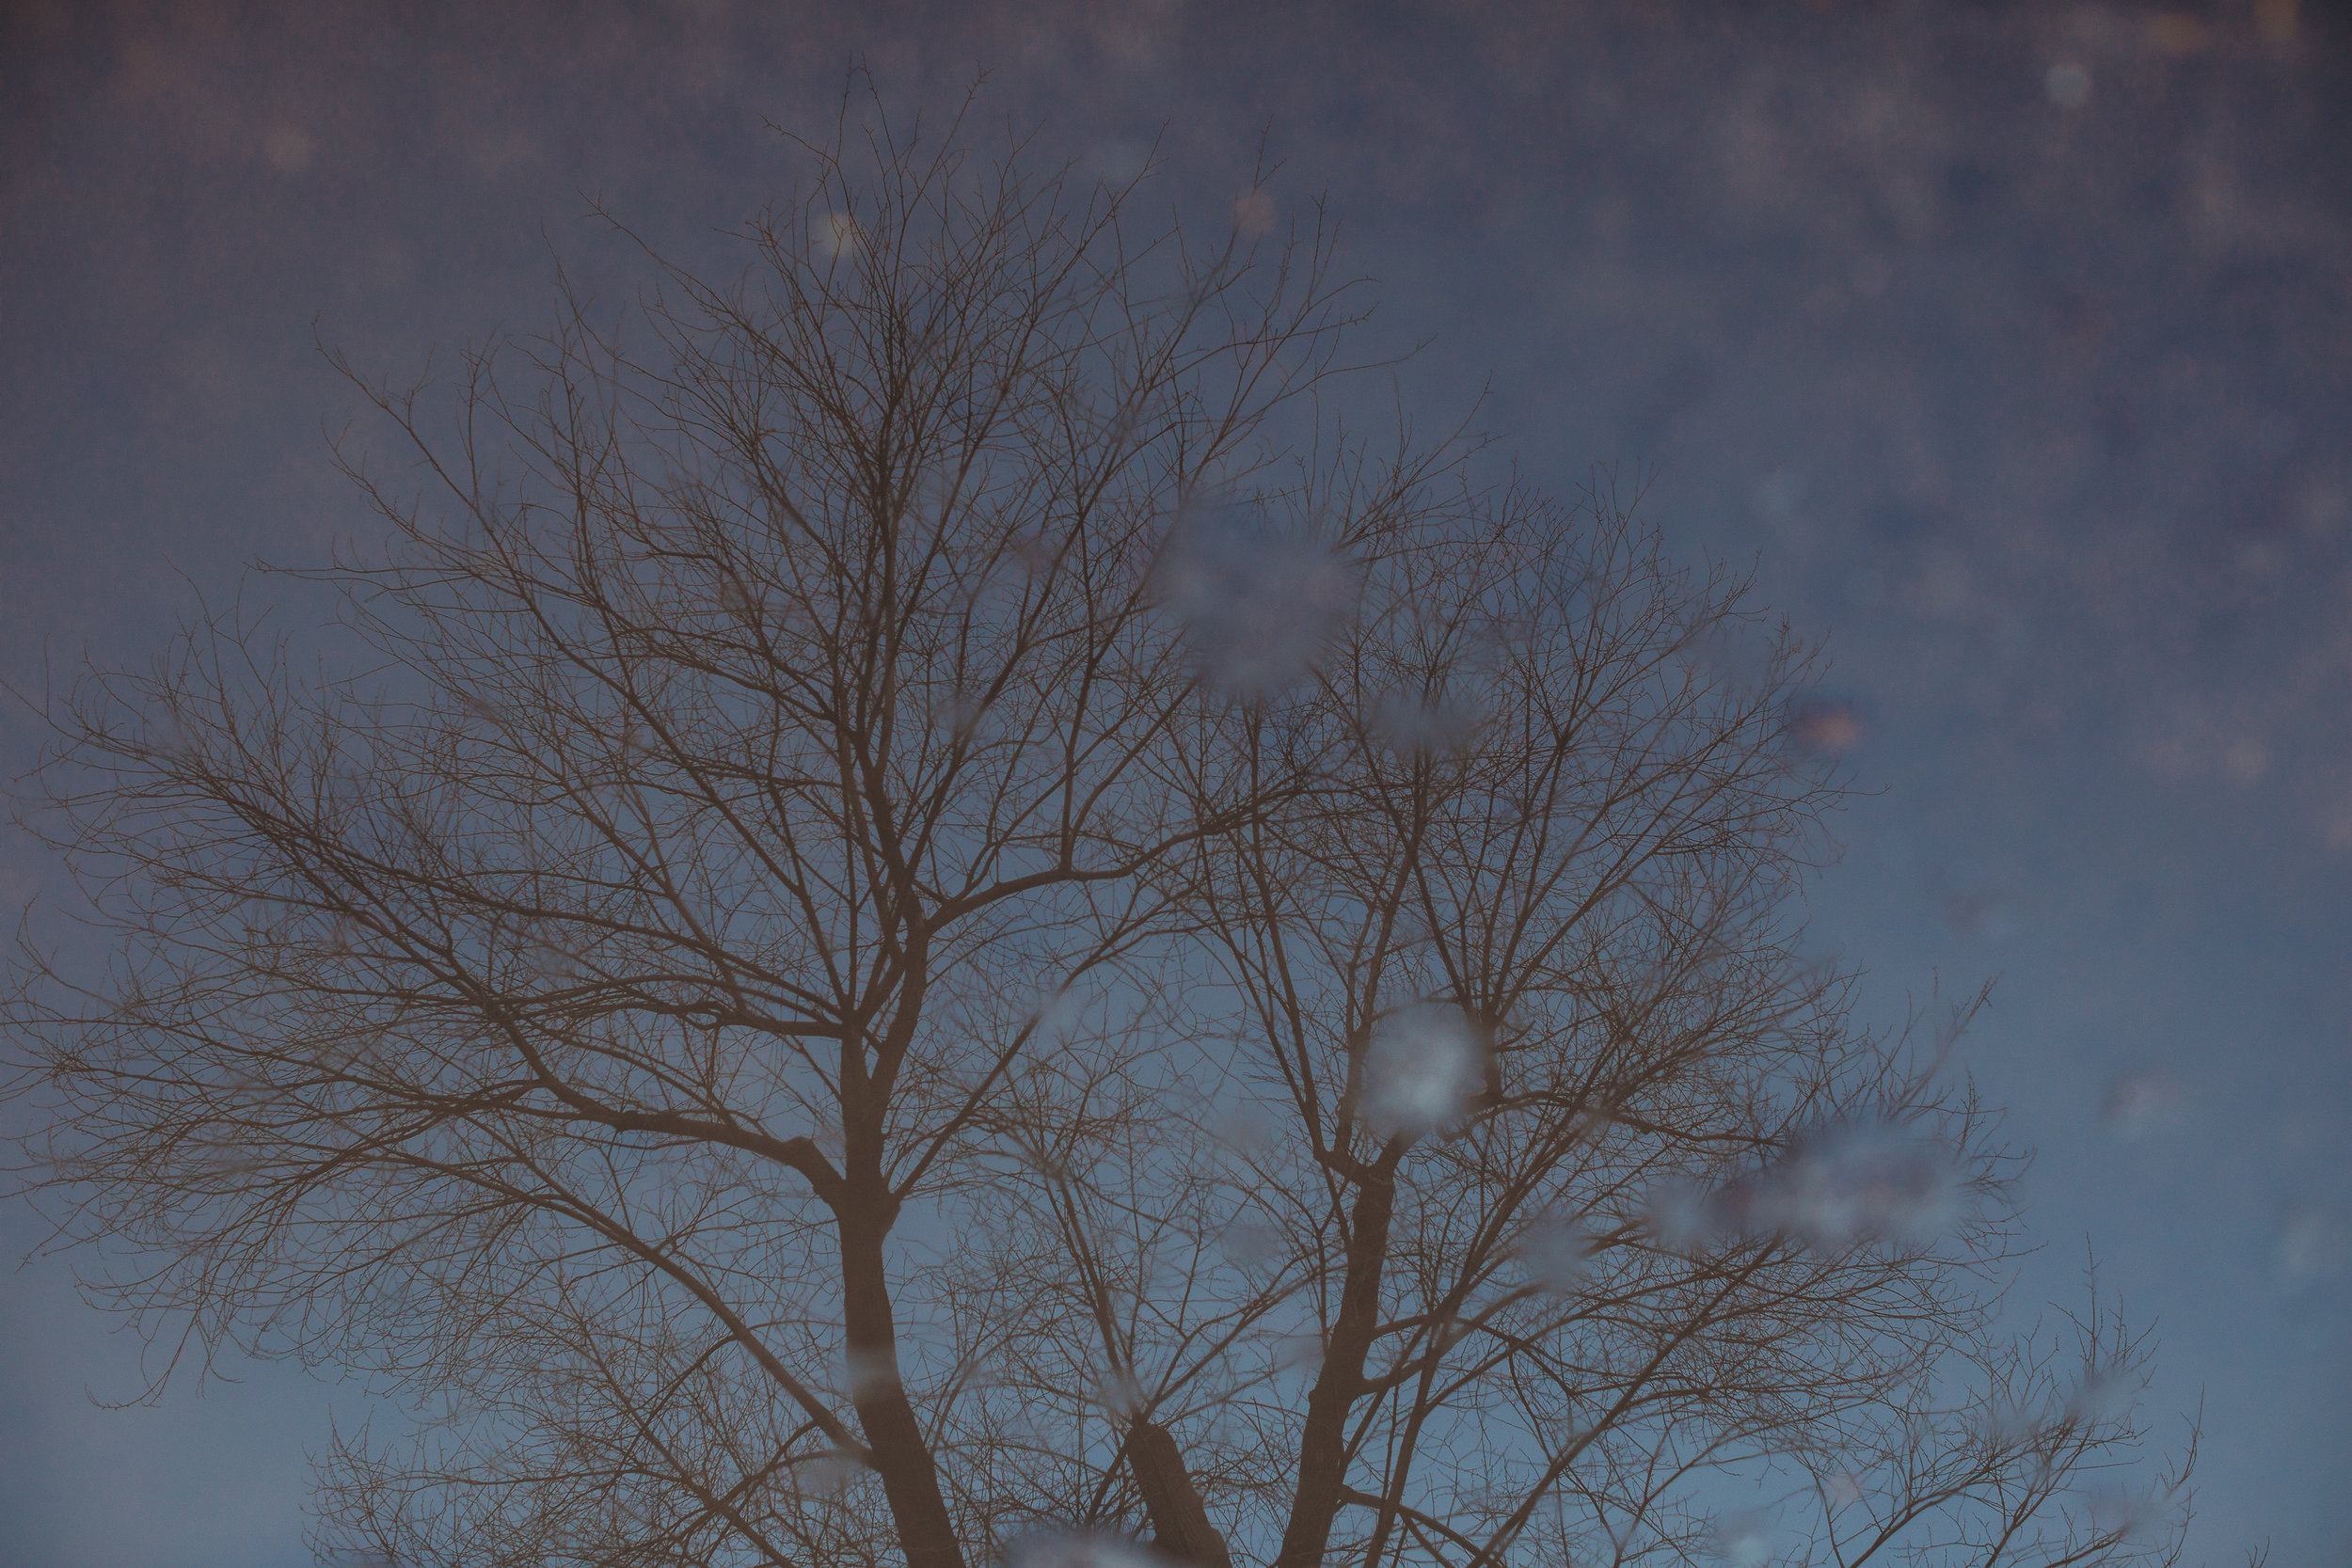 Melting ice puddles in February reflecting the bare trees at the Common. Boston family photographer Joy LeDuc.